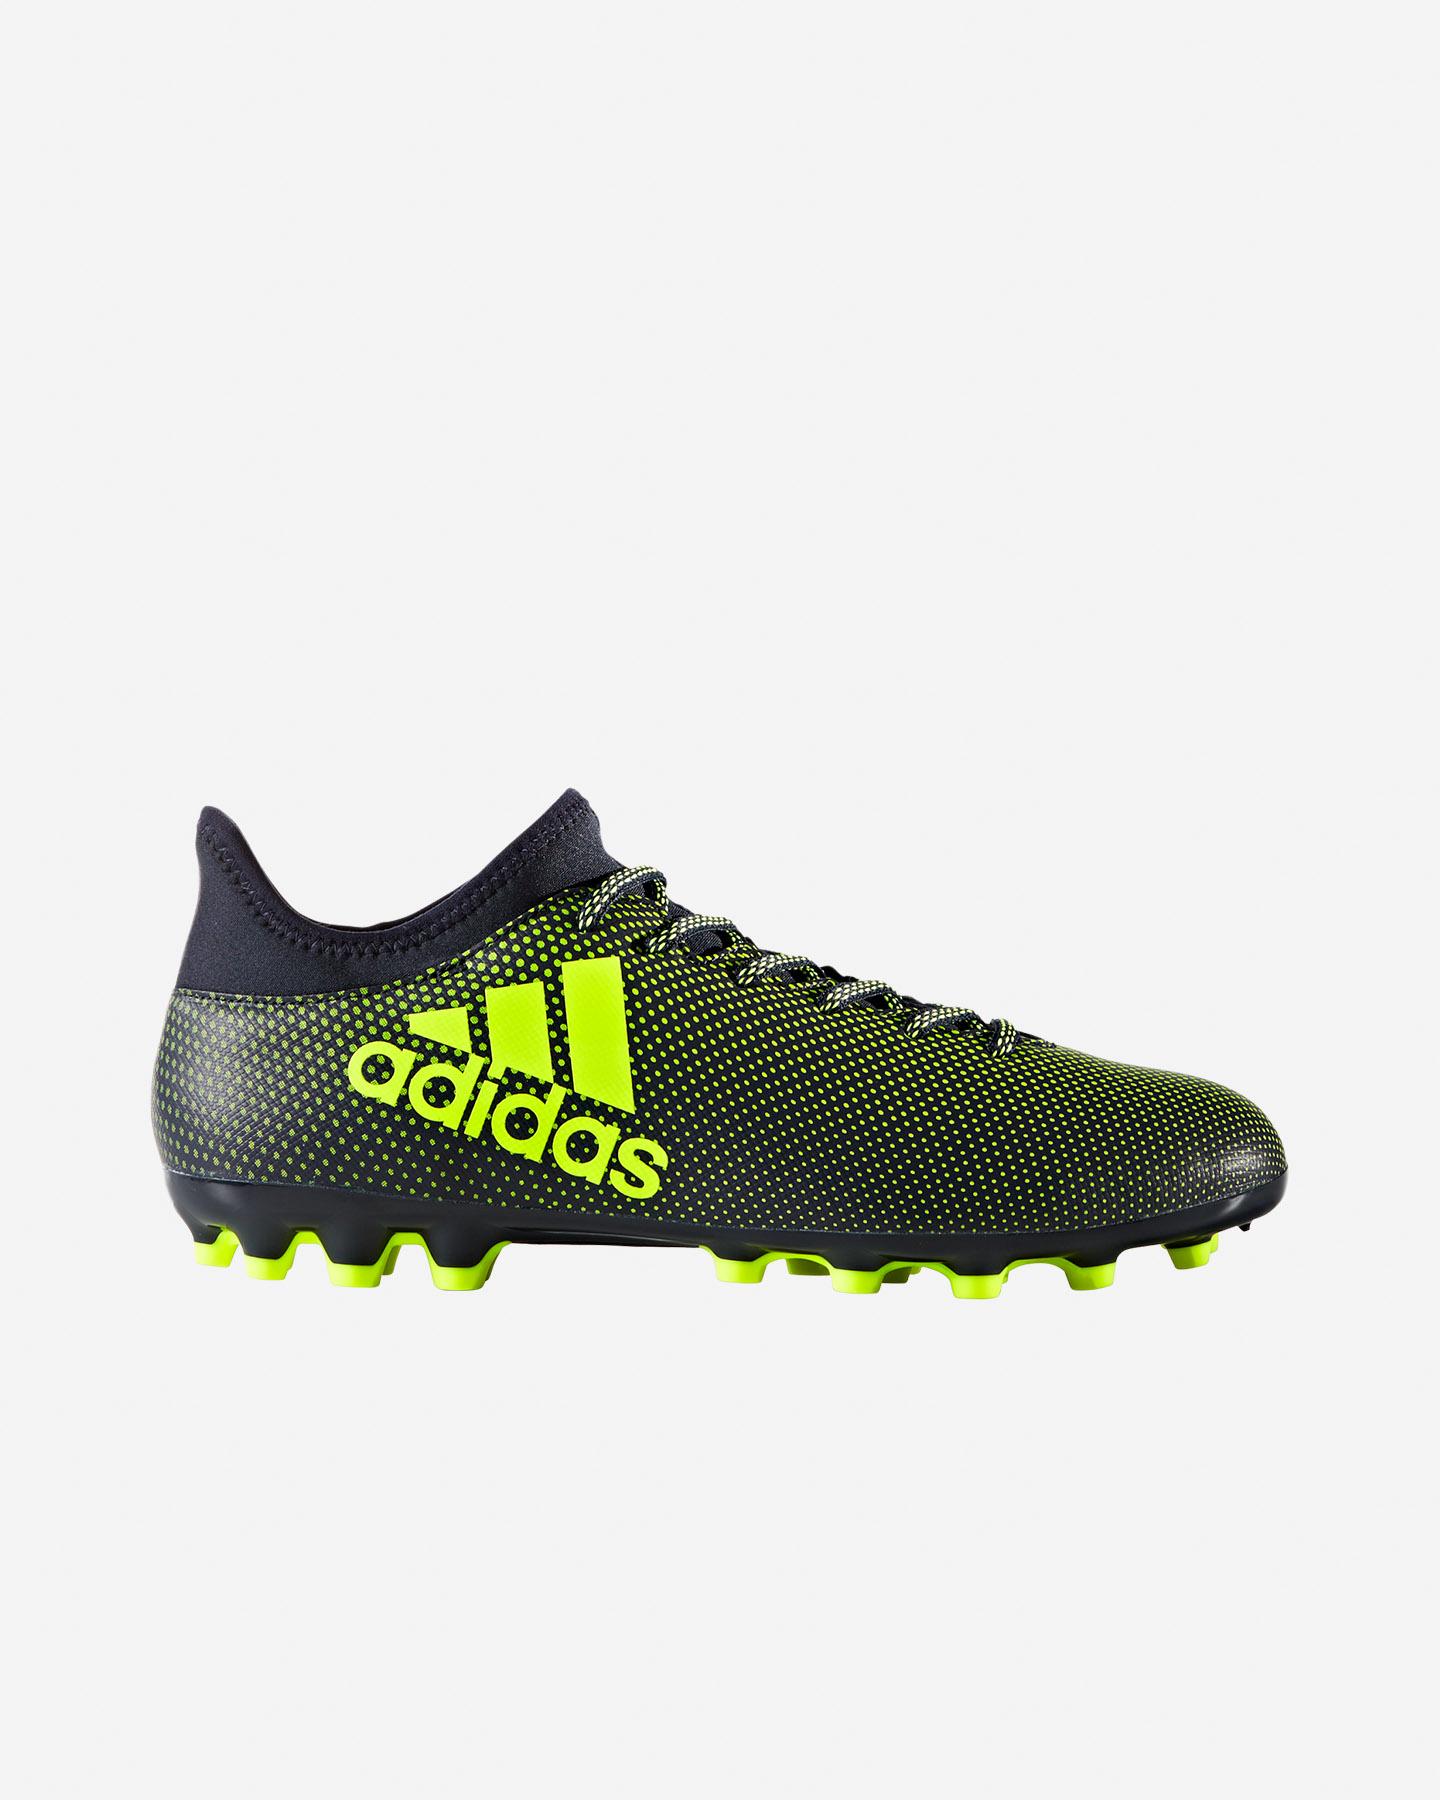 Sport Cisalfa M Su Calcio 3 Wtuqzyqci X By8894 Adidas Ag Hqtip 17 Scarpe K3FJT1cl